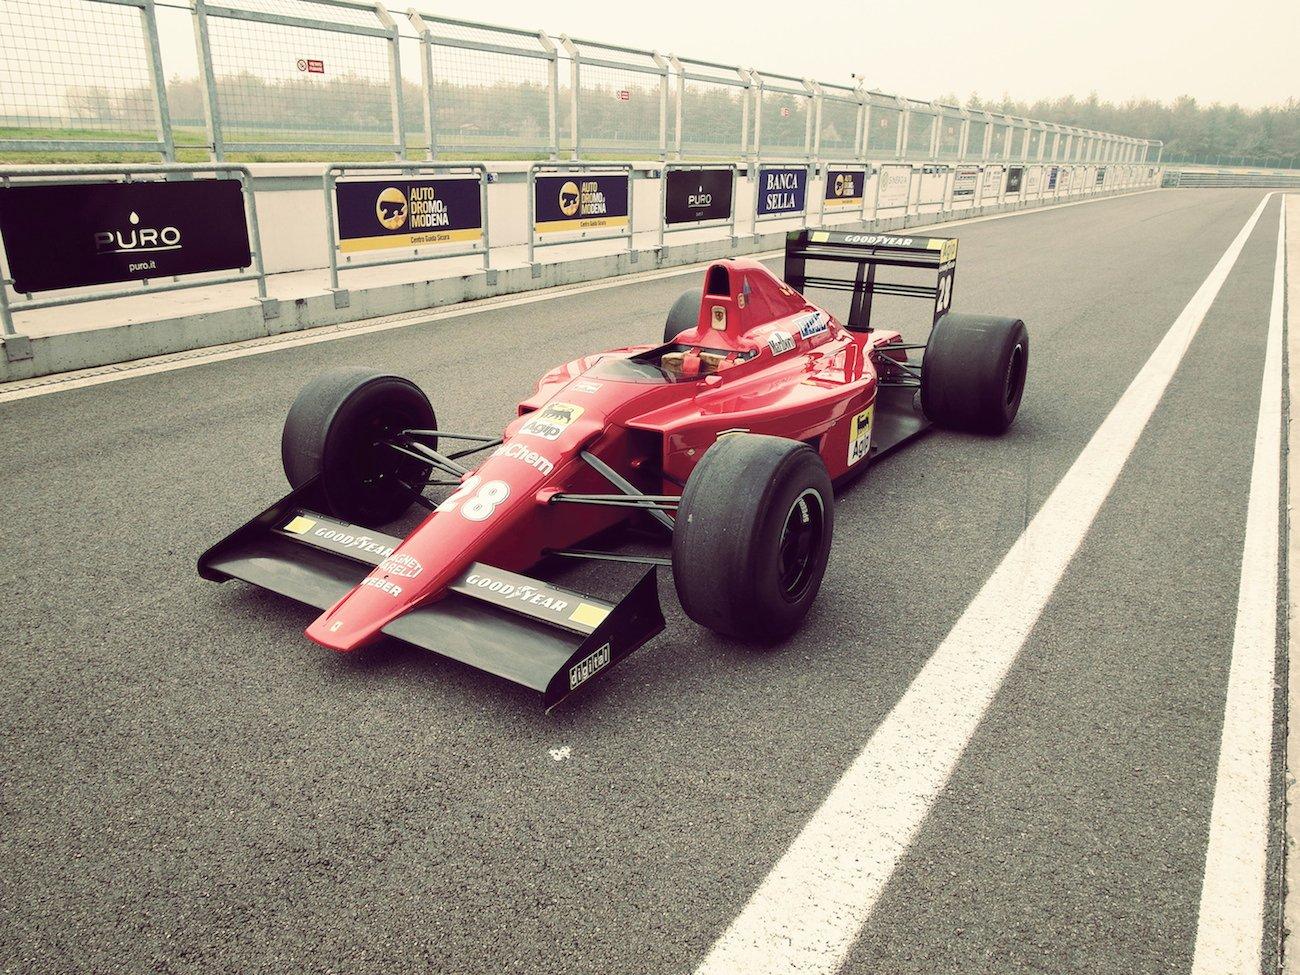 Magnificent Old F1 Car For Sale Photos - Classic Cars Ideas - boiq.info